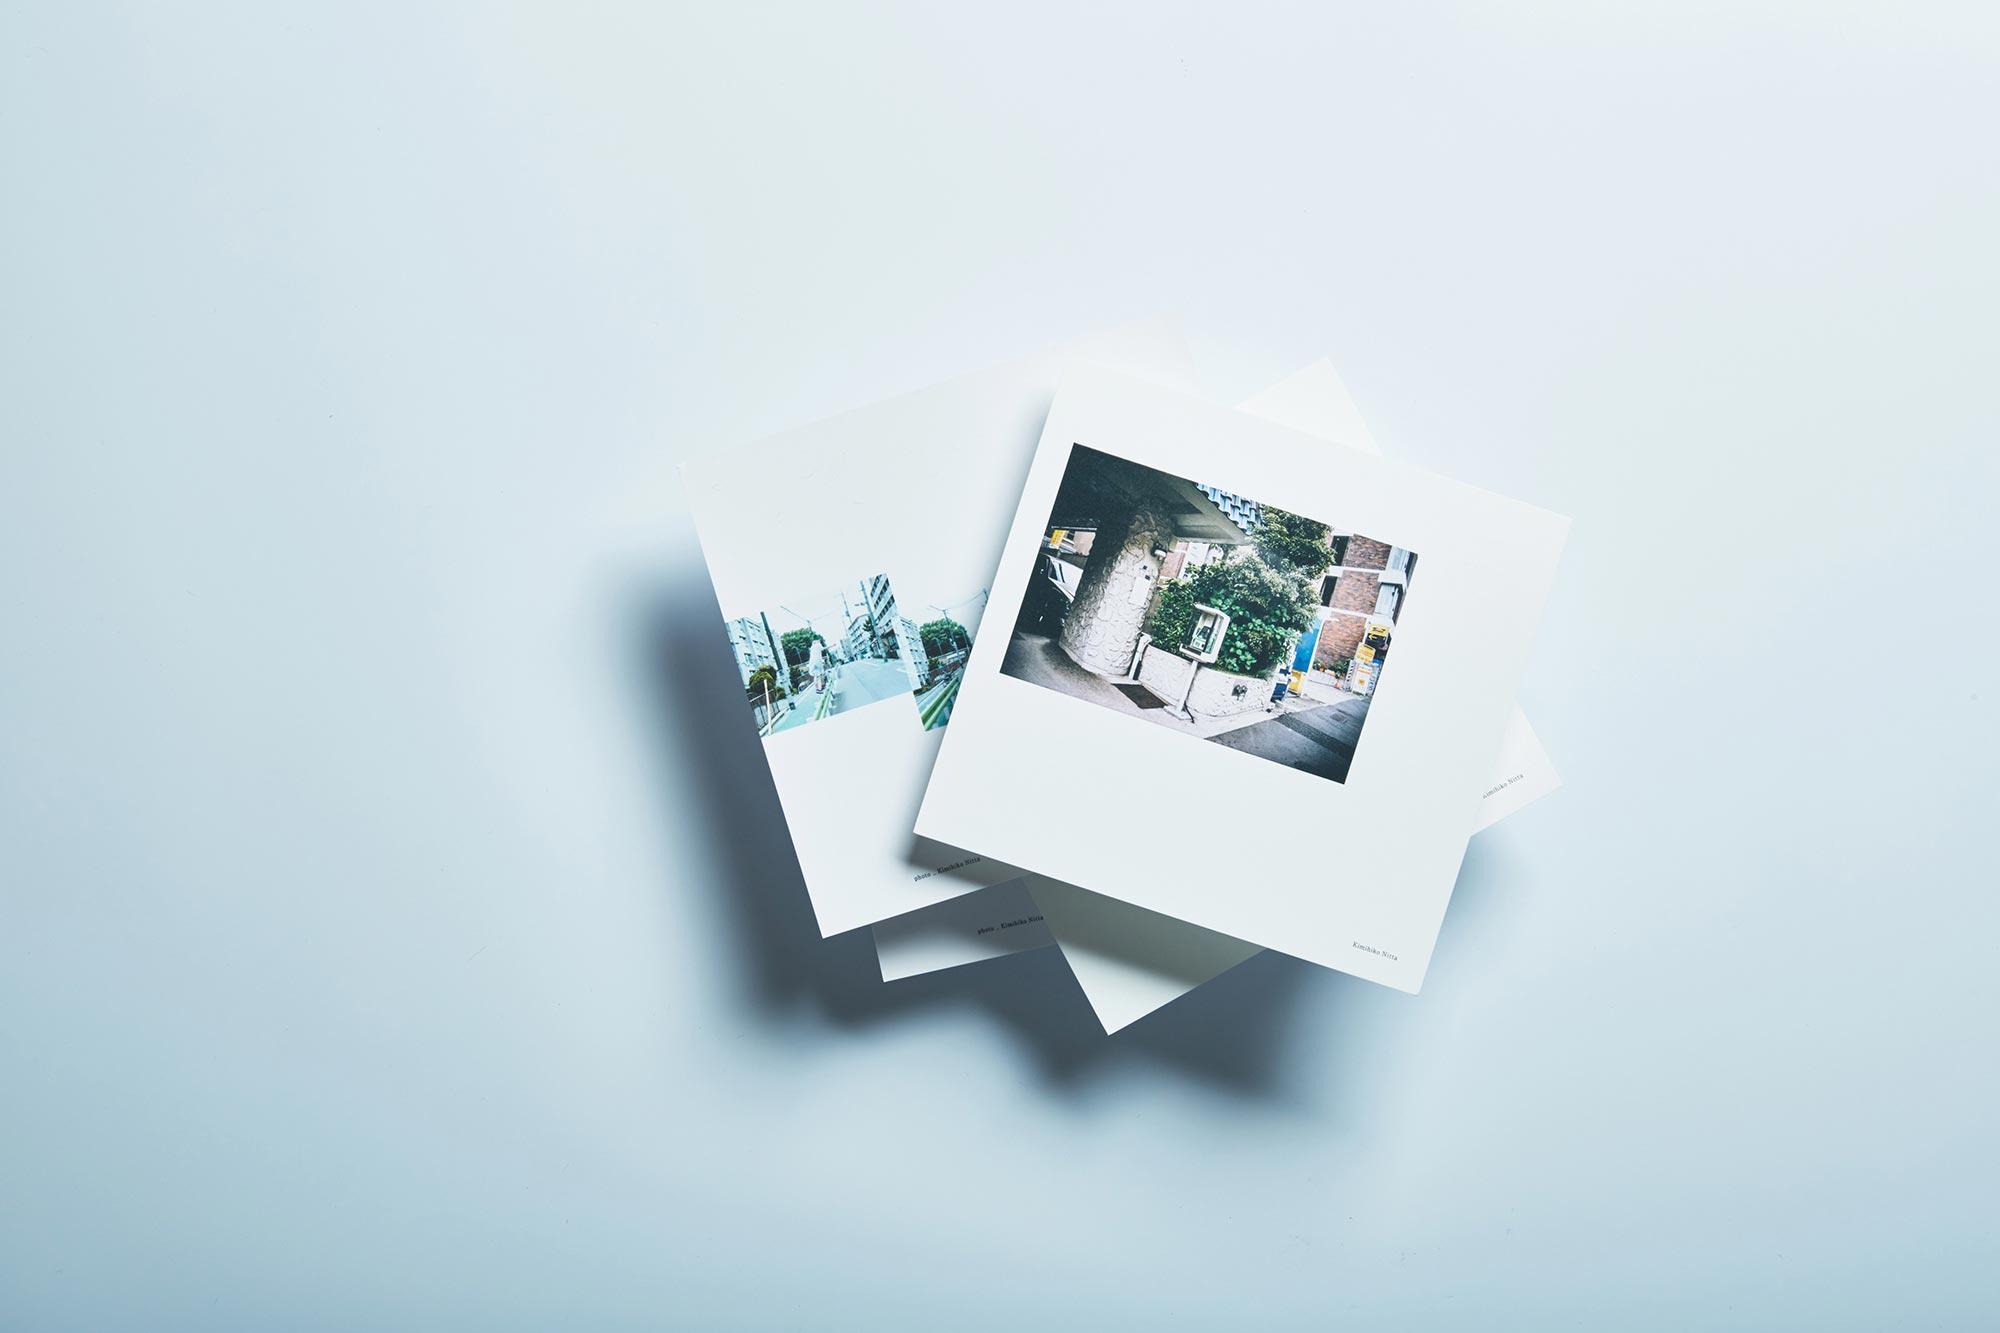 014kimihikonitta_card